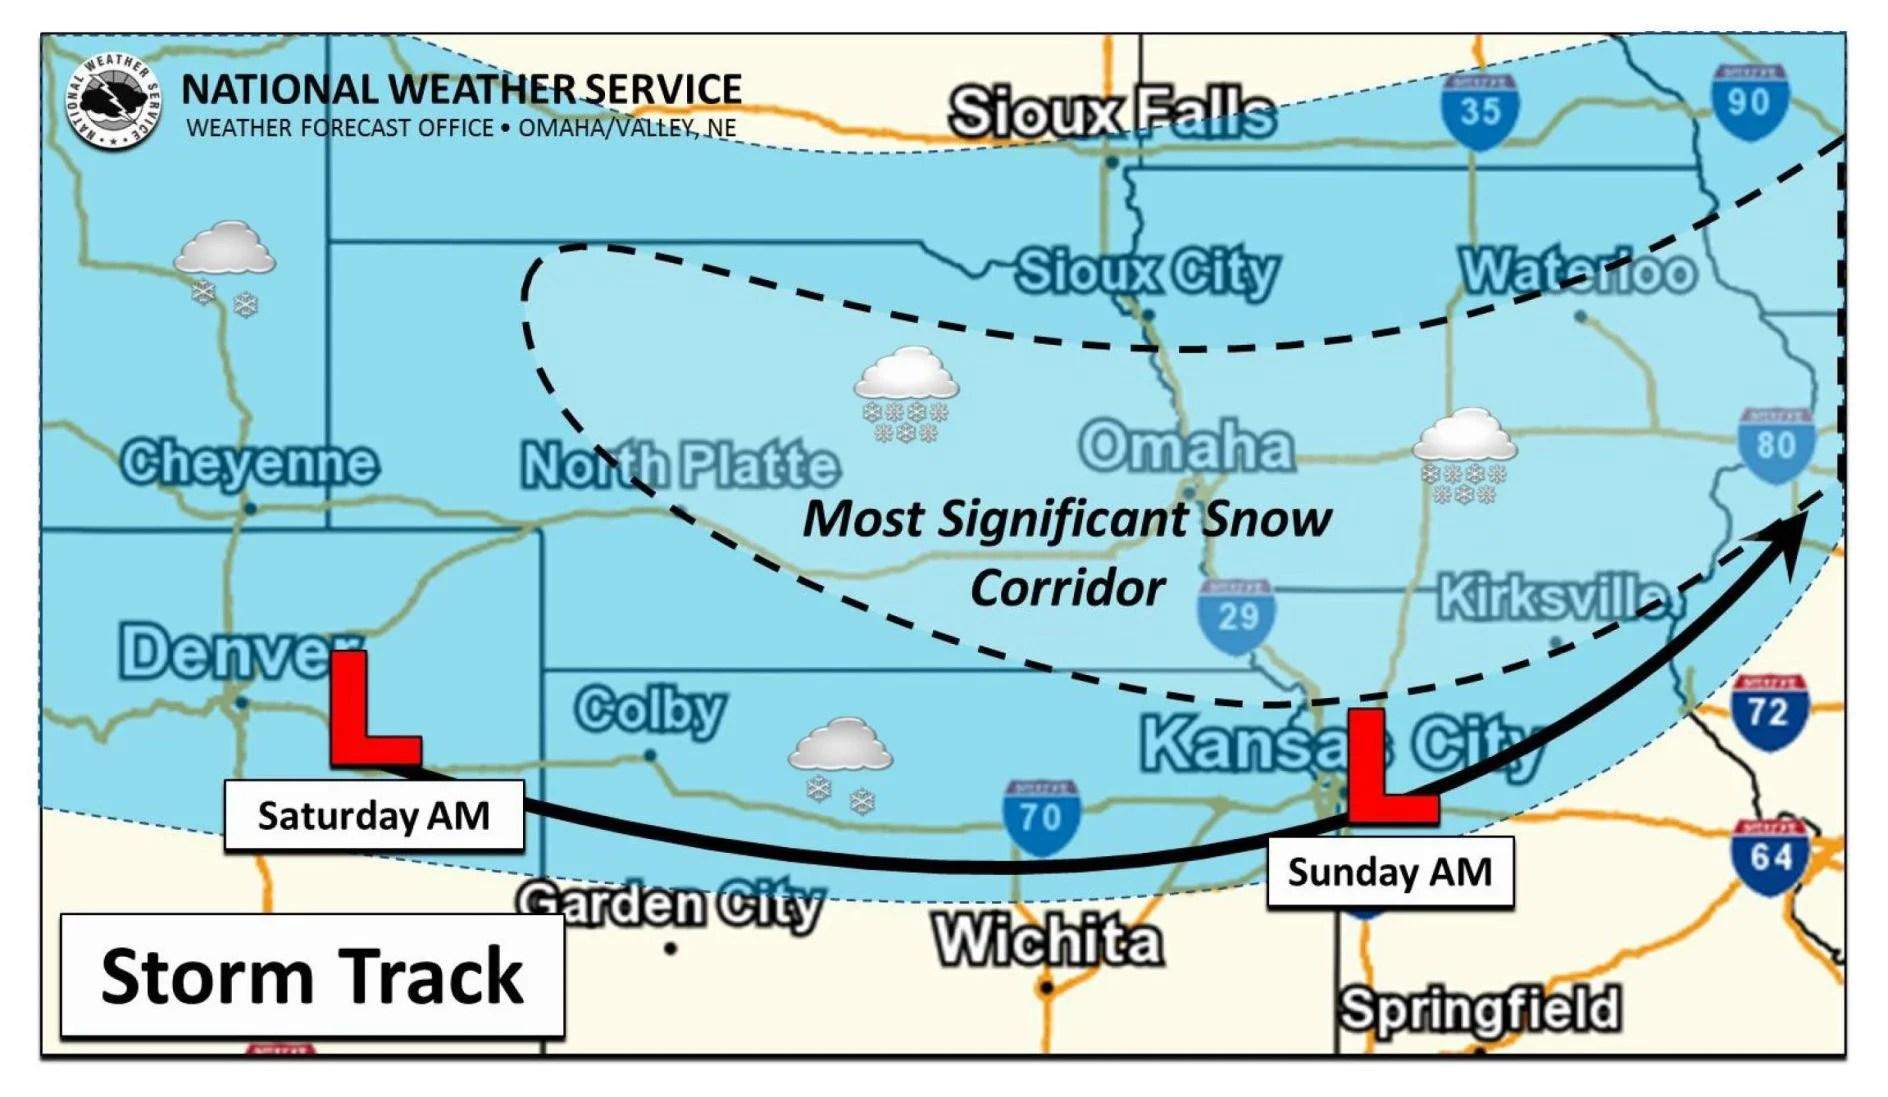 medium resolution of blizzard forming diagram wiring diagrams schematic snow blizzard diagram blizzard forming diagram